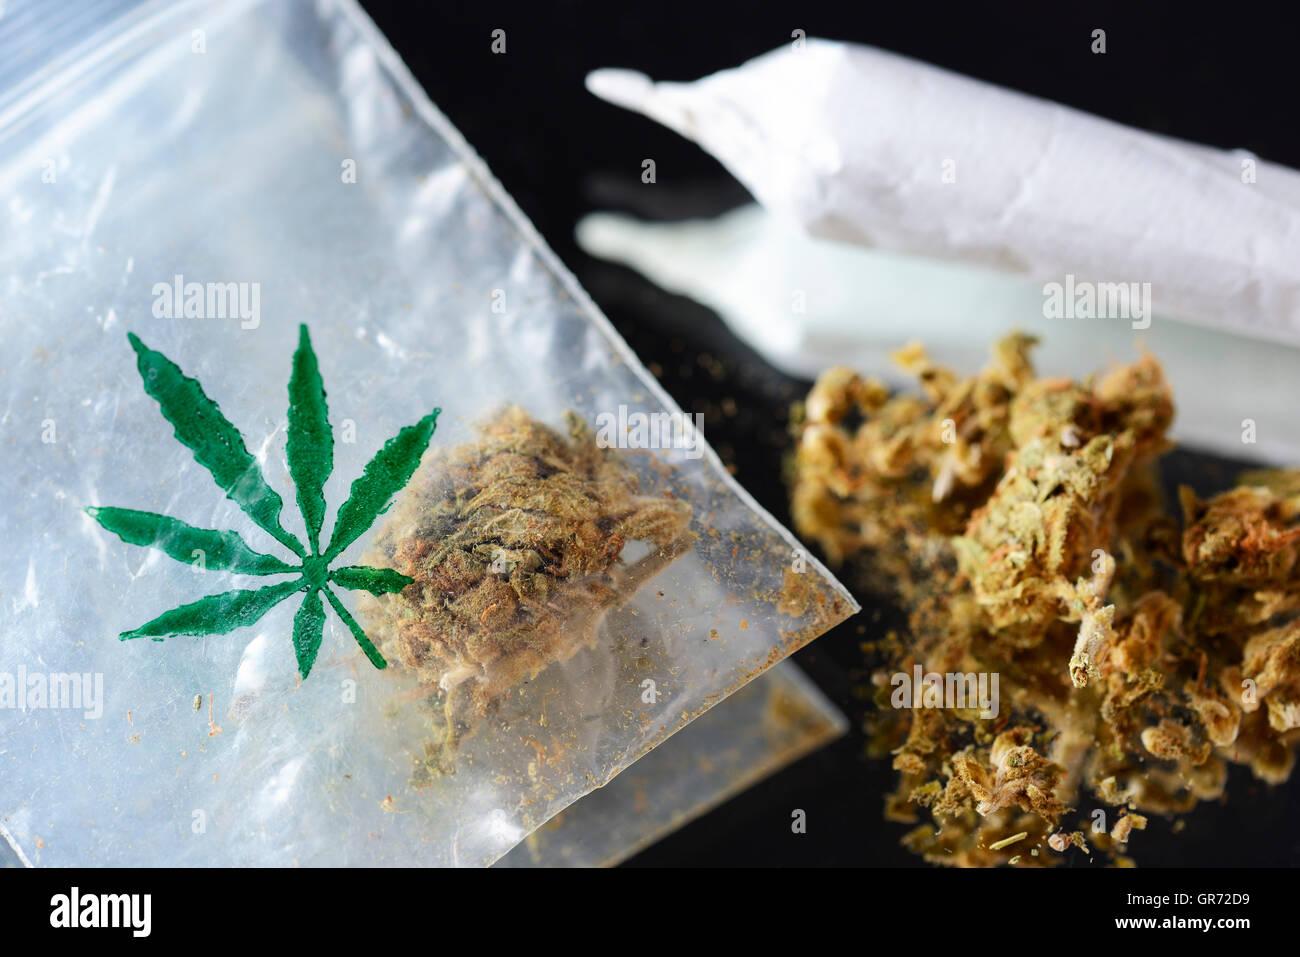 Joint And Marijuana - Stock Image